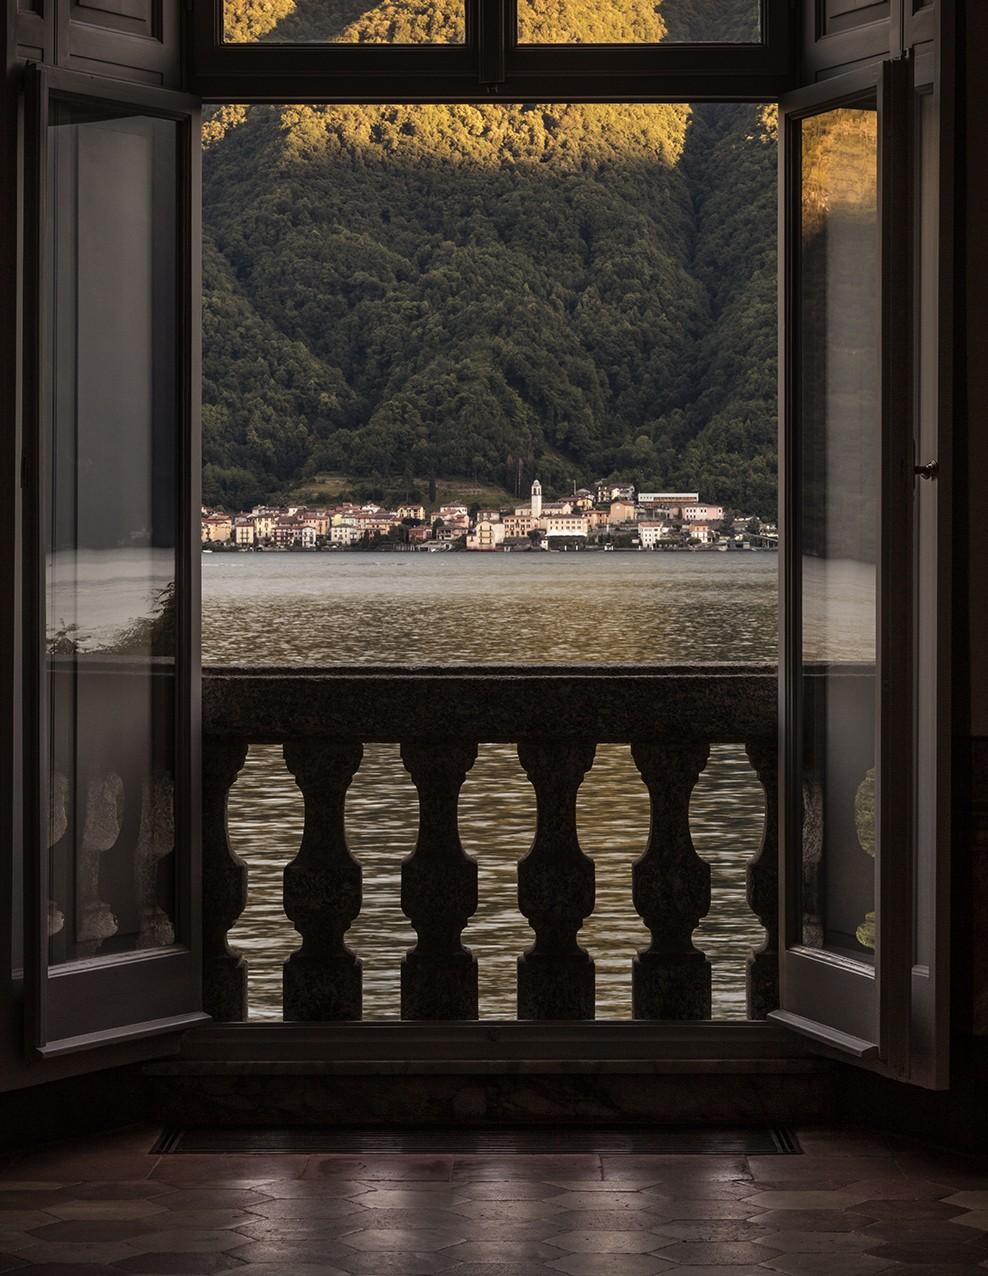 Villa Balbiano luxury lakefront villa available accommodation balcony with splendid view on lake Como 23.left000VB int